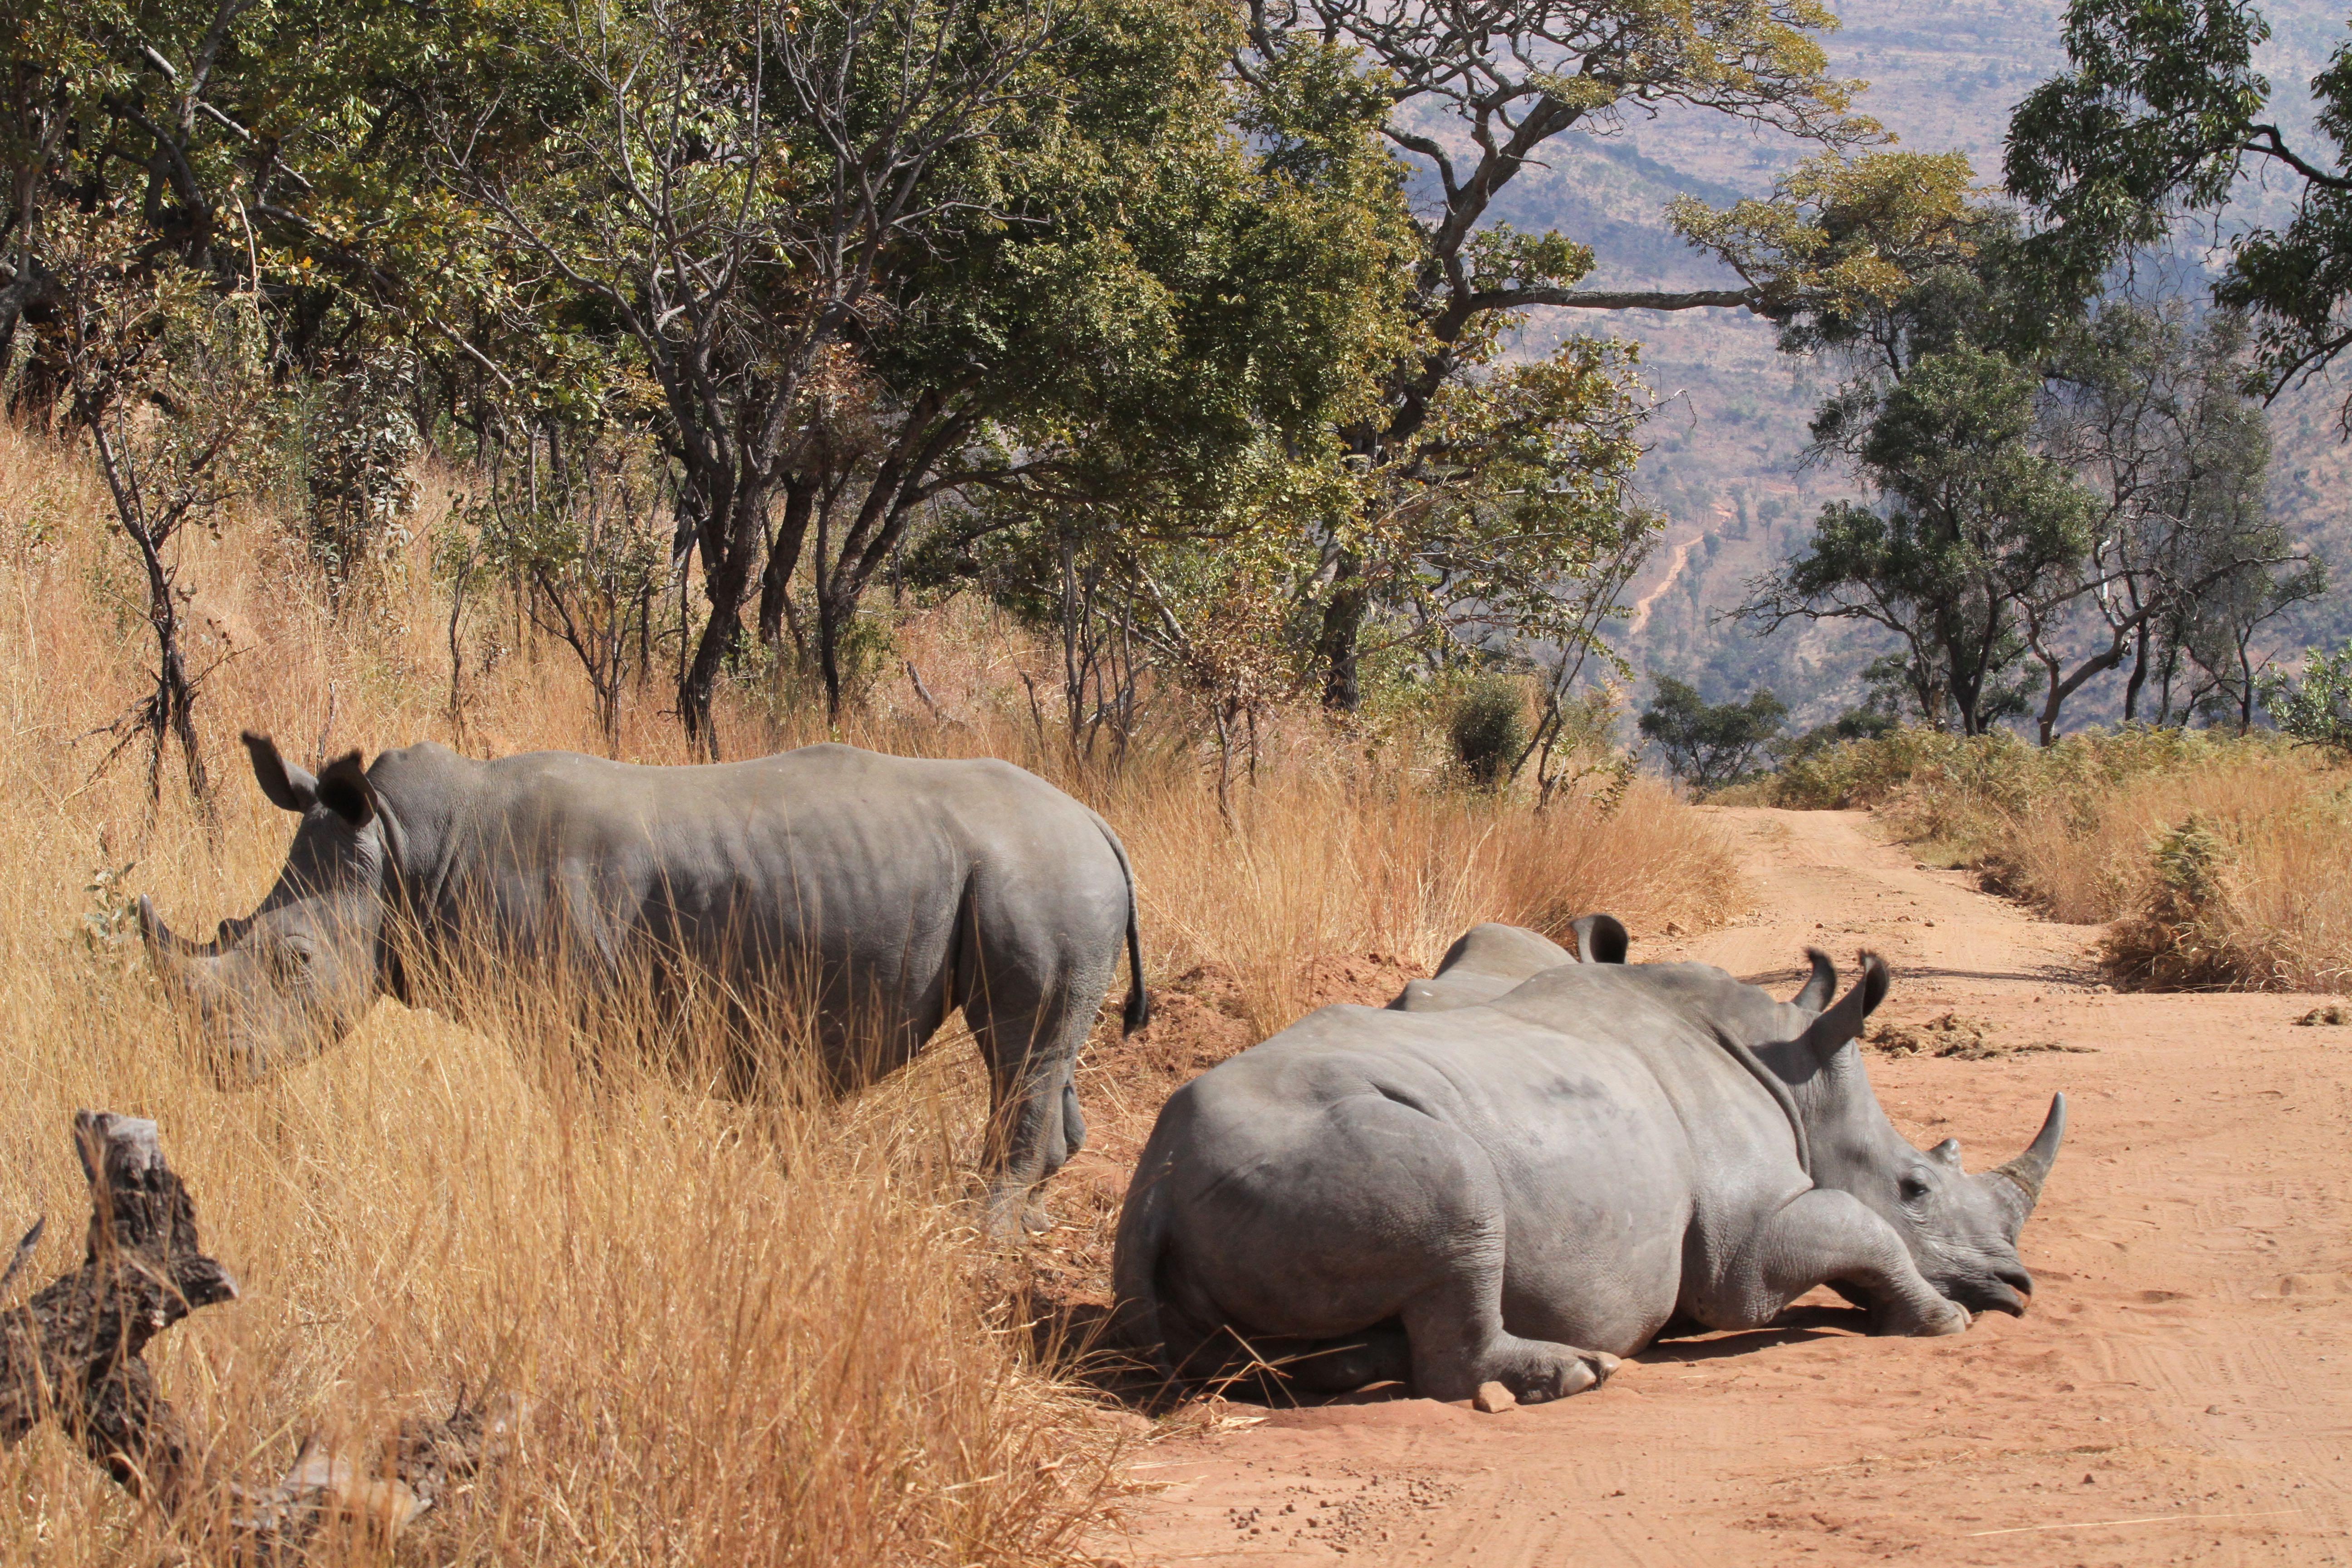 White Rhino basking in the sun